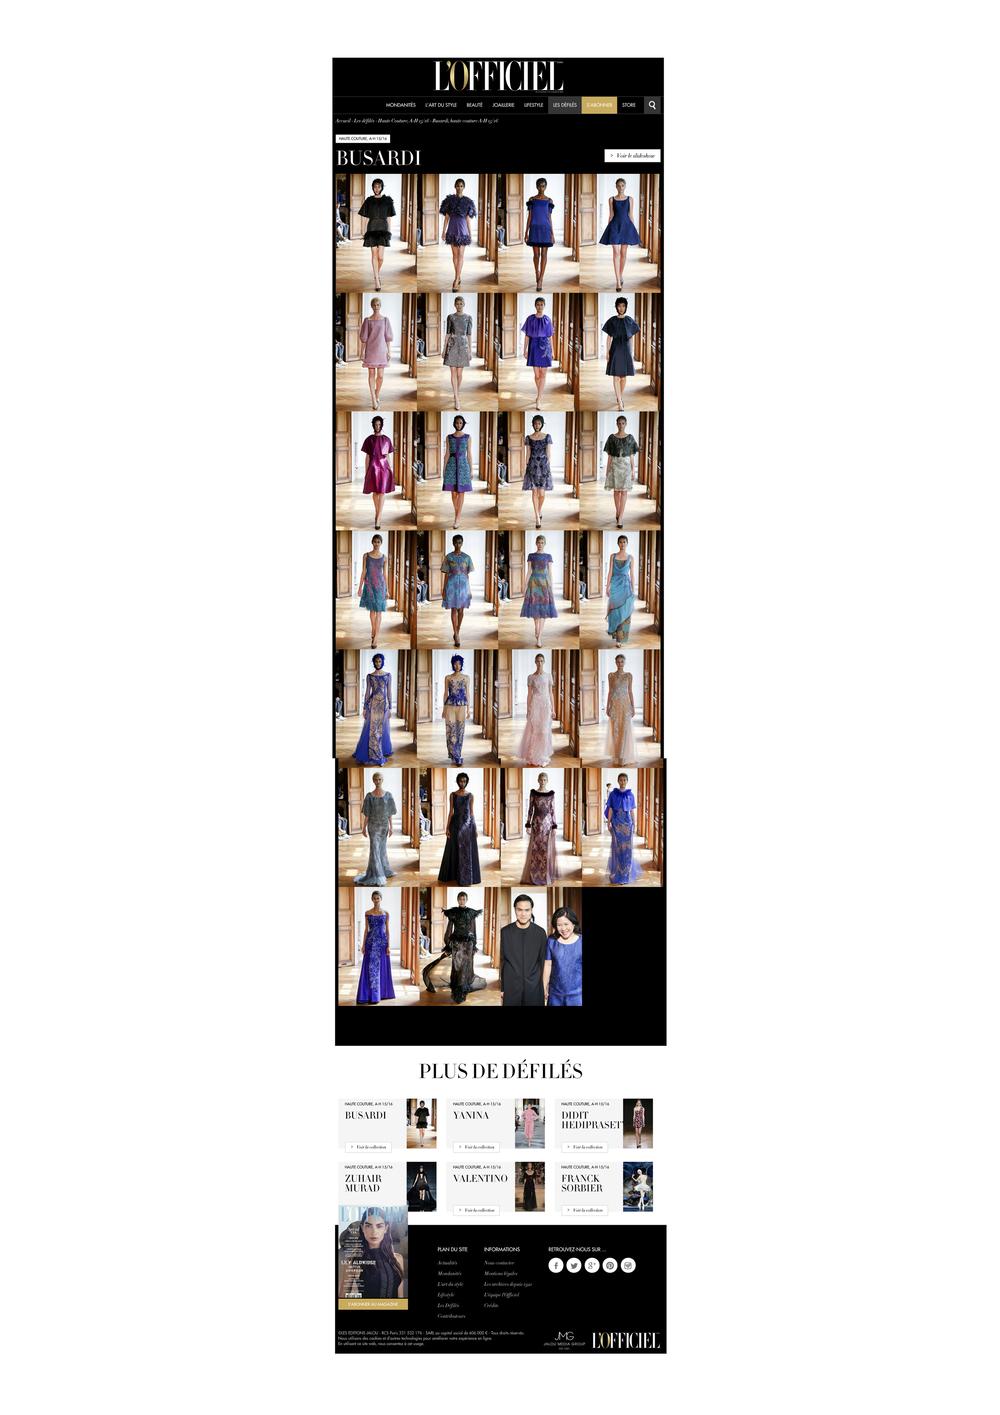 Tuck - L'Officiel Paris - July 2015 - A4 - 03.jpg